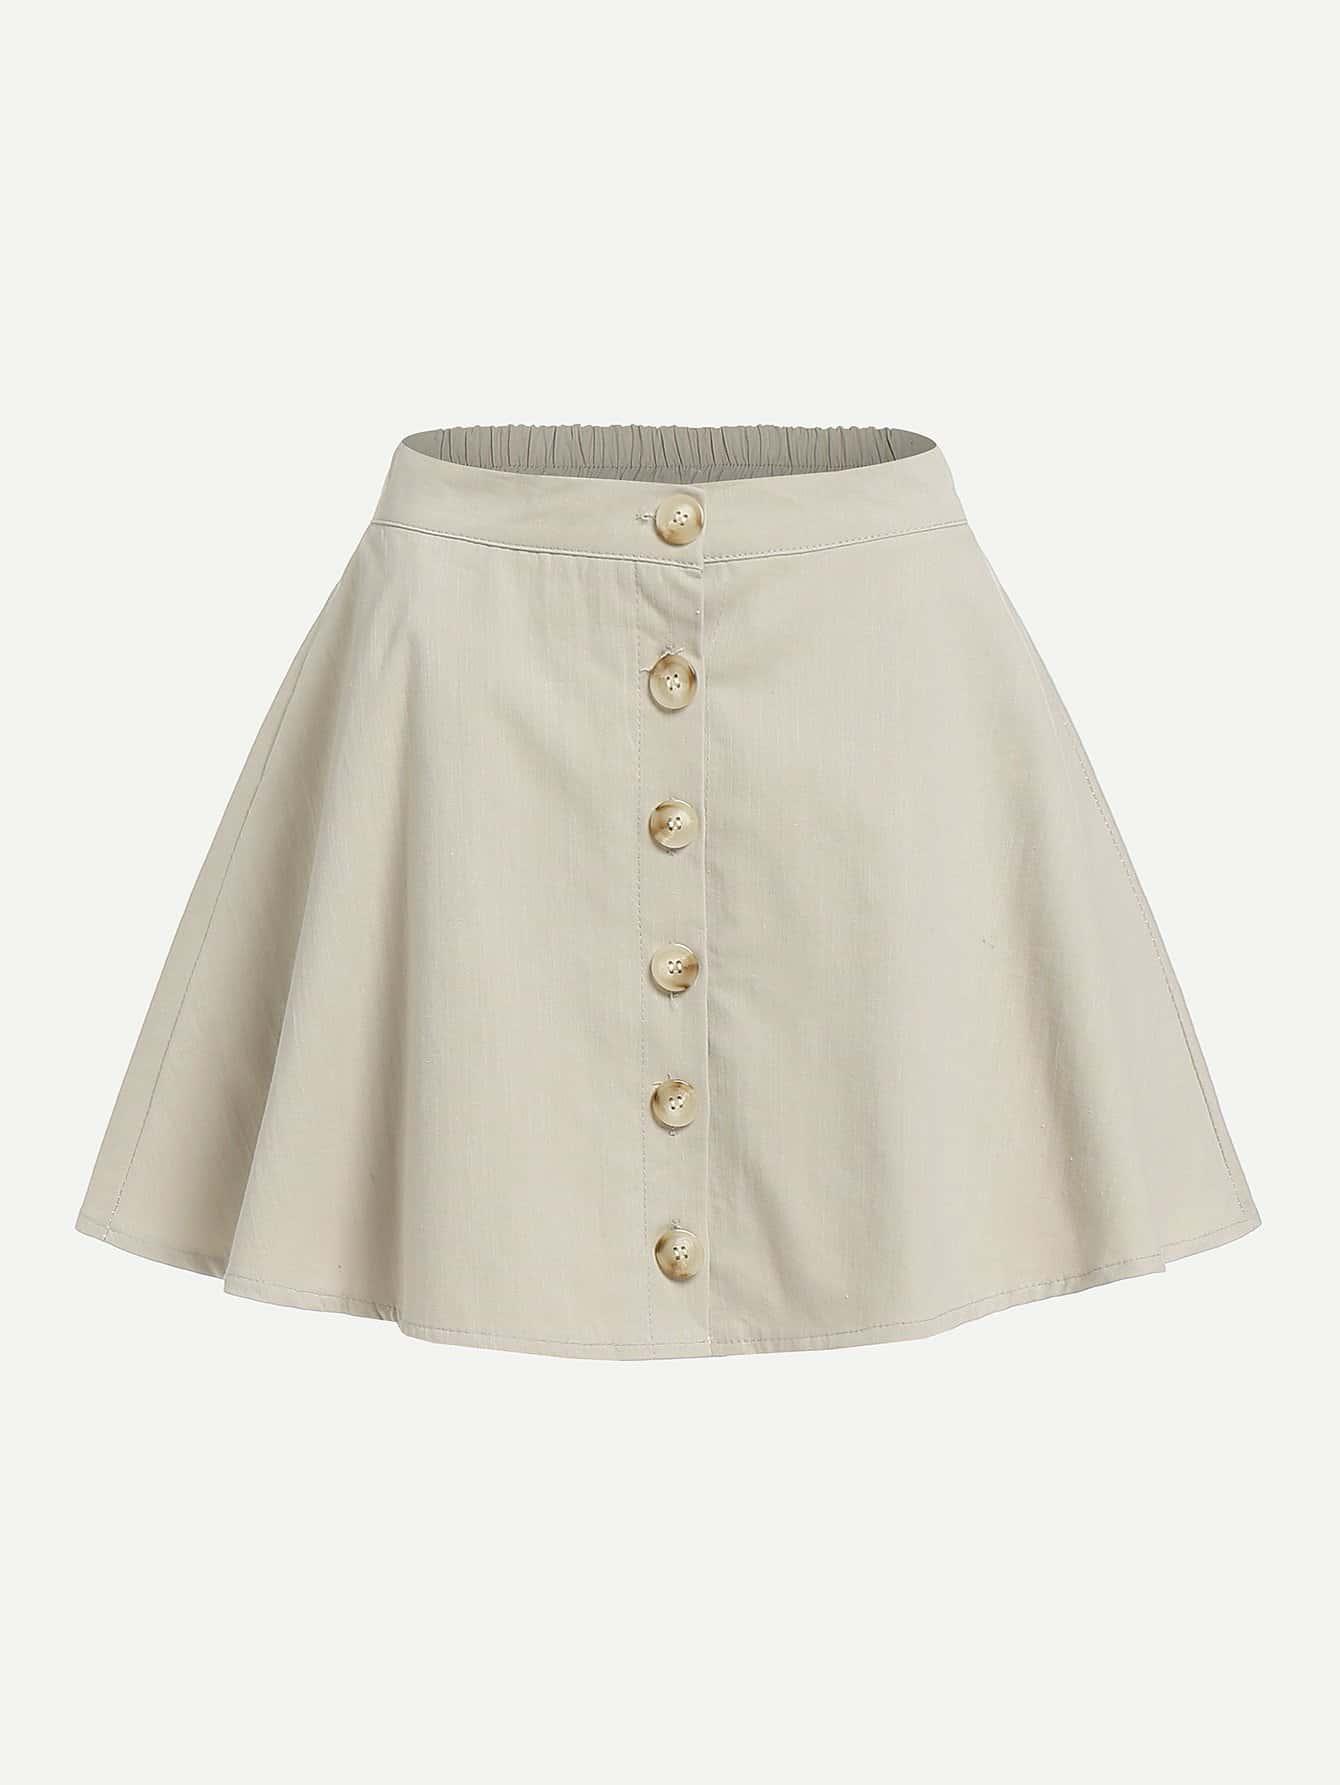 Single Breasted Front Skirt girls single breasted raw hem skirt